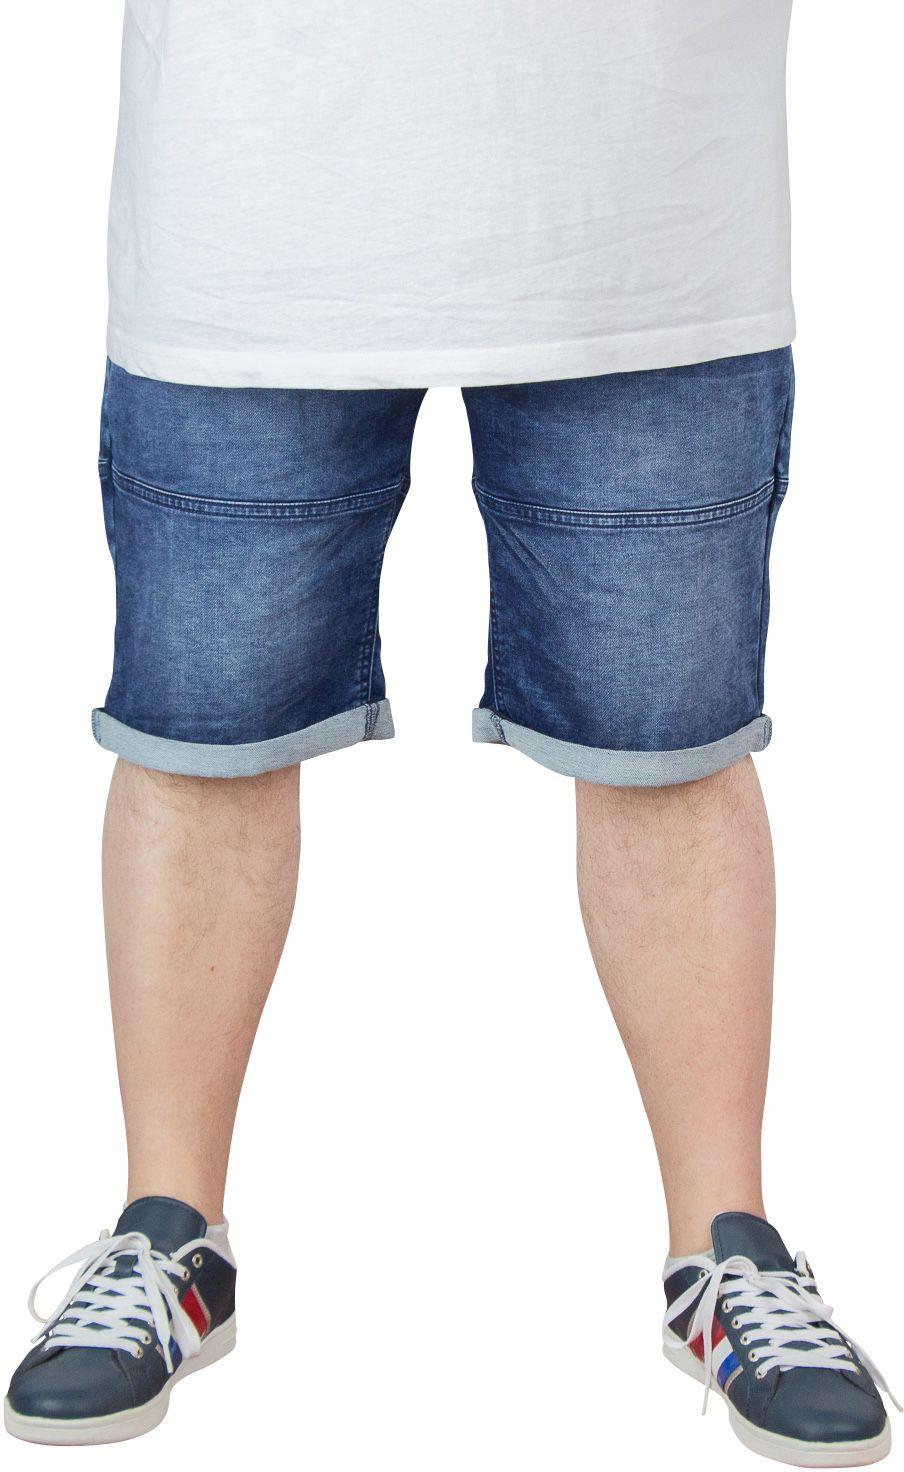 Bemuda Taille Elastiquée Indigo All Size du 2XL au 8XL